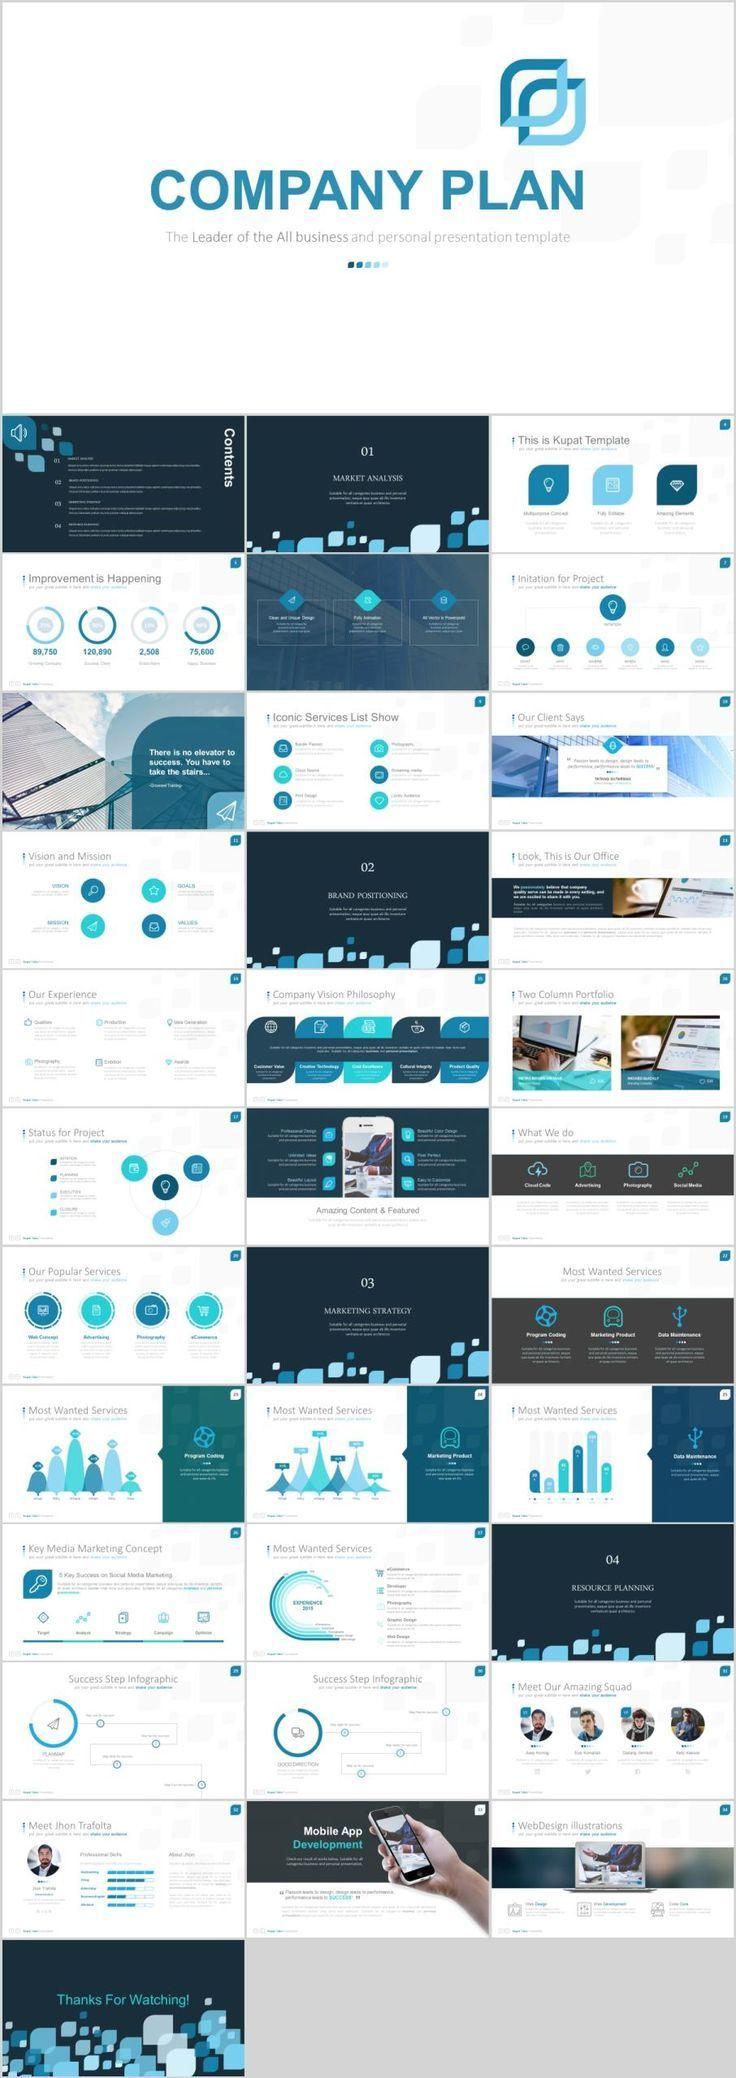 Infographic Design Business Infographic Data Visualisation